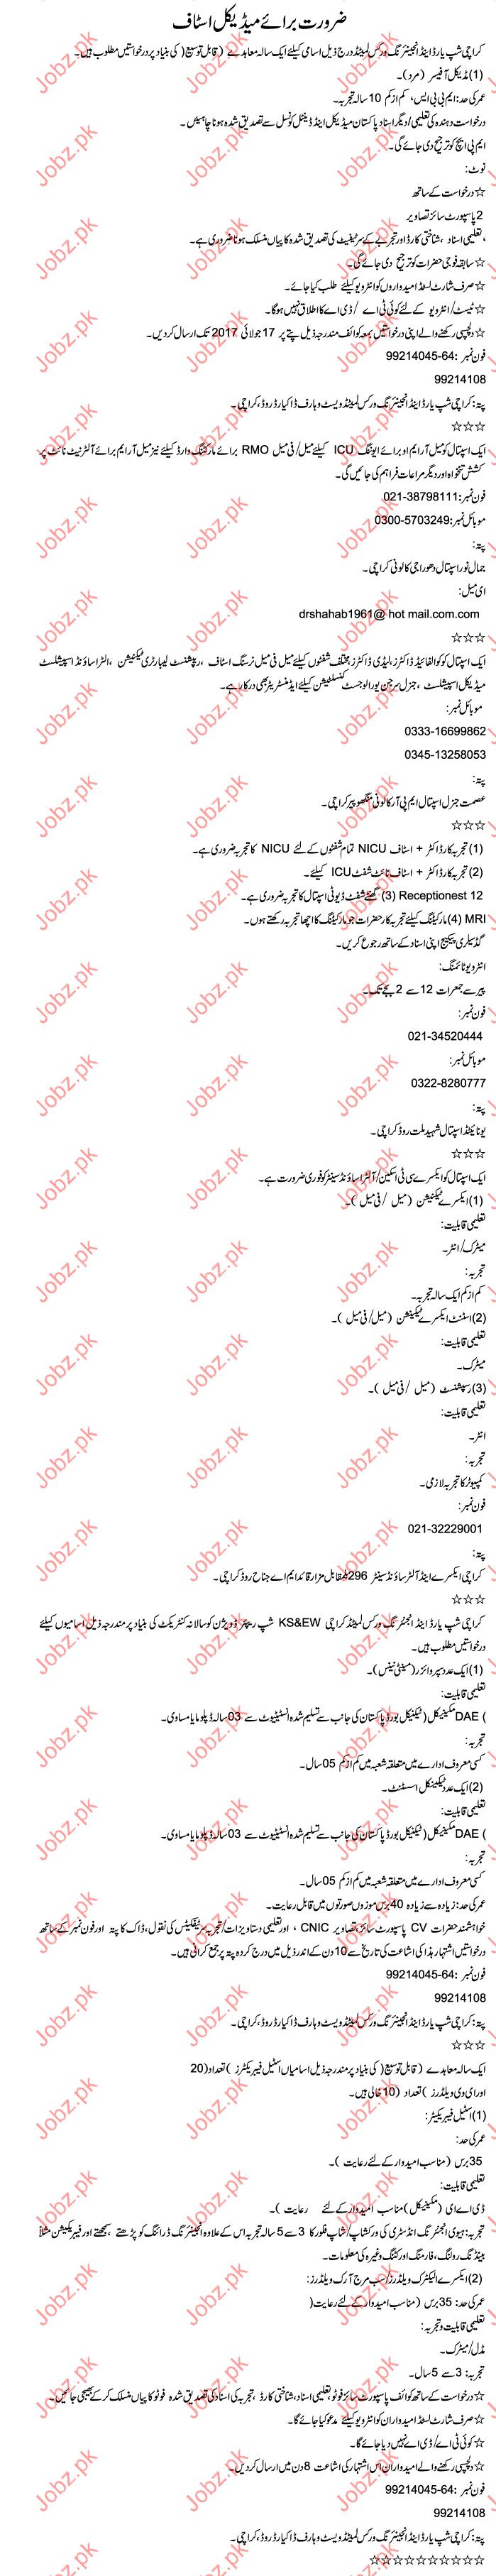 Medical Staff Jobs In Karachi Shipyard & Engineering Works